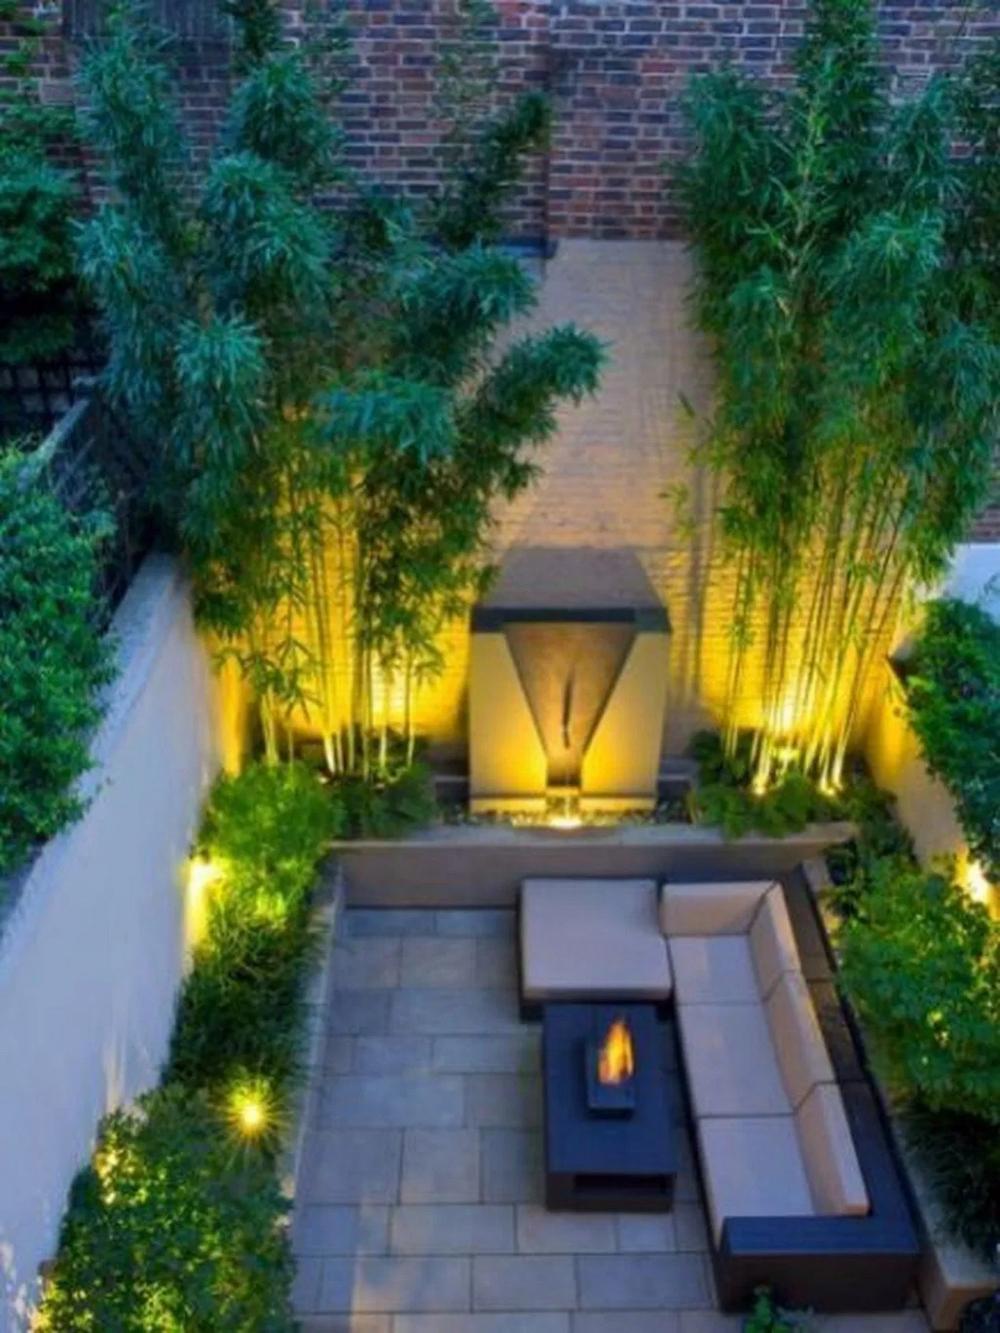 15 beautiful terrace garden ideas for your home 6 ...